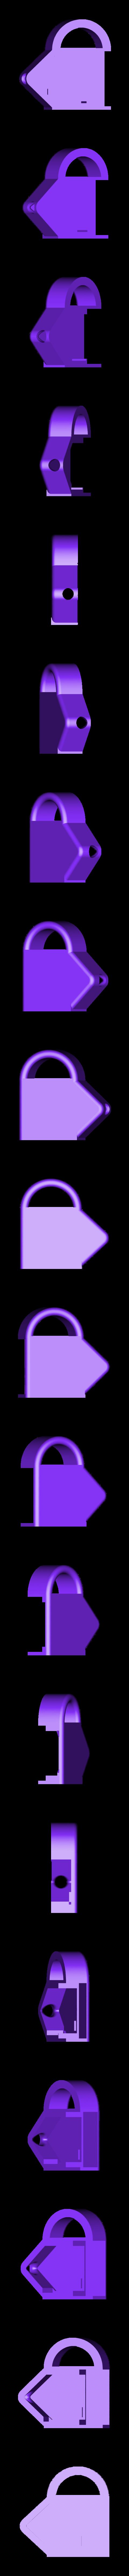 Base lampe led Lapin.stl Download STL file Keychain Mouse led light / Keychain Led mouse (stack 2032) • Design to 3D print, AlDei